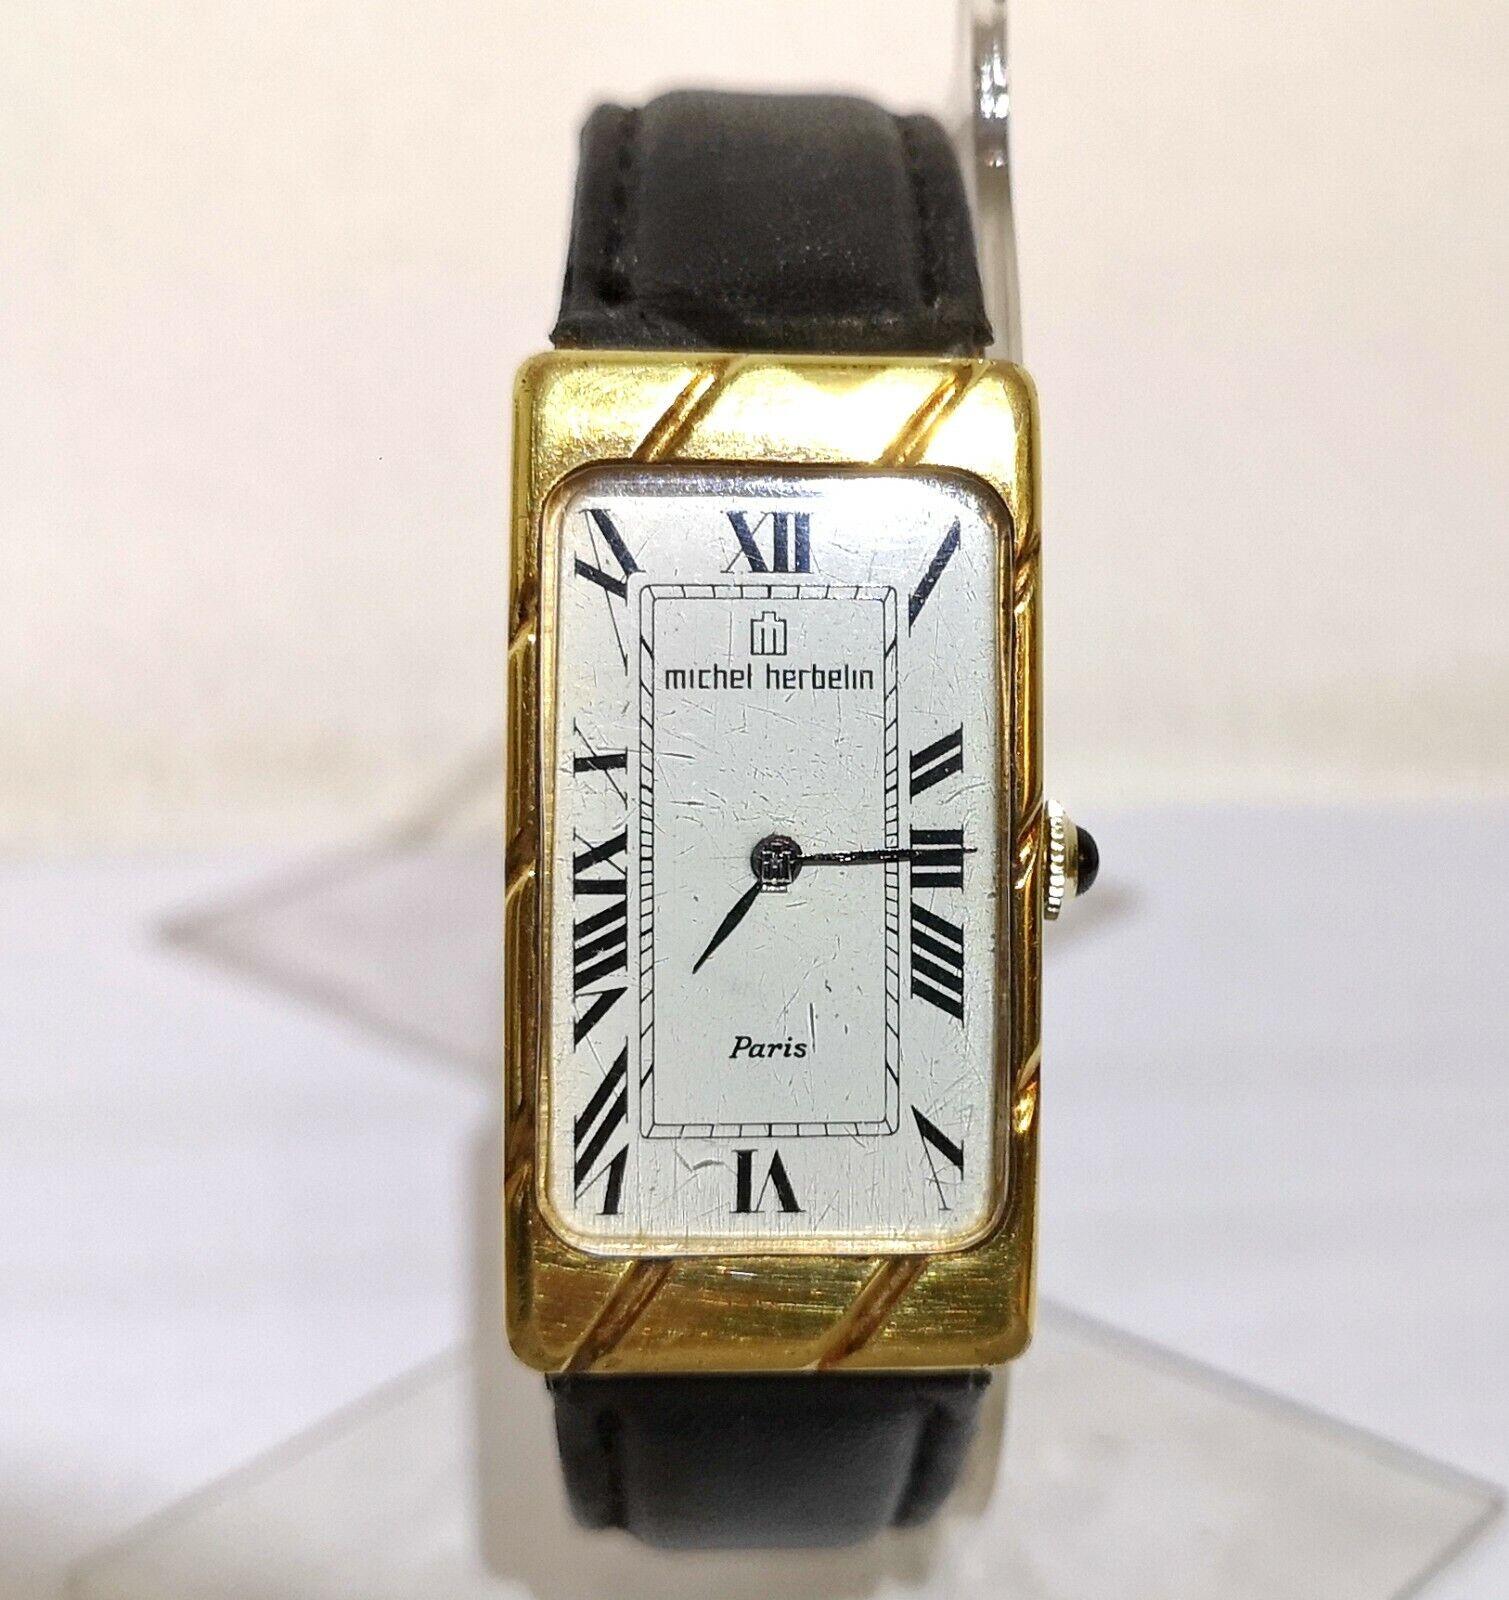 Esprit Art Deco Com vintage watch michel herbelin art deco style